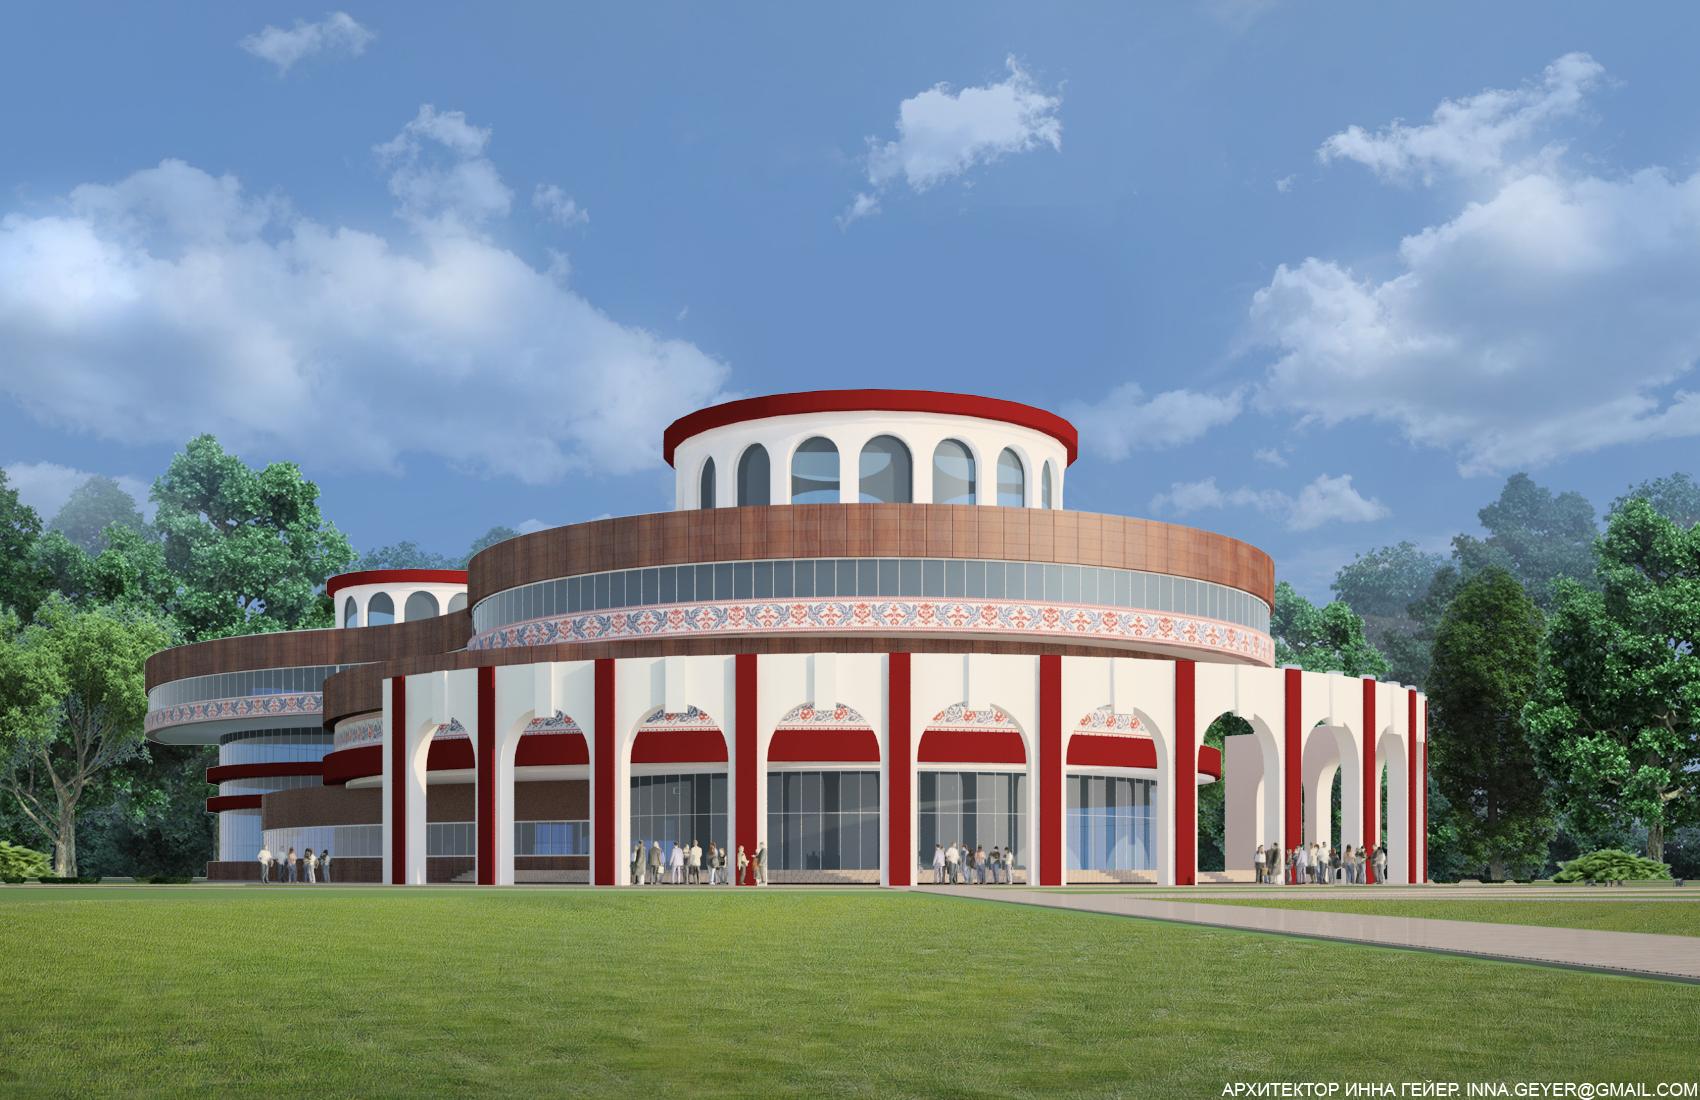 Разработка архитектурной концепции театра оперы и балета фото f_57352f4de601cb3f.jpg